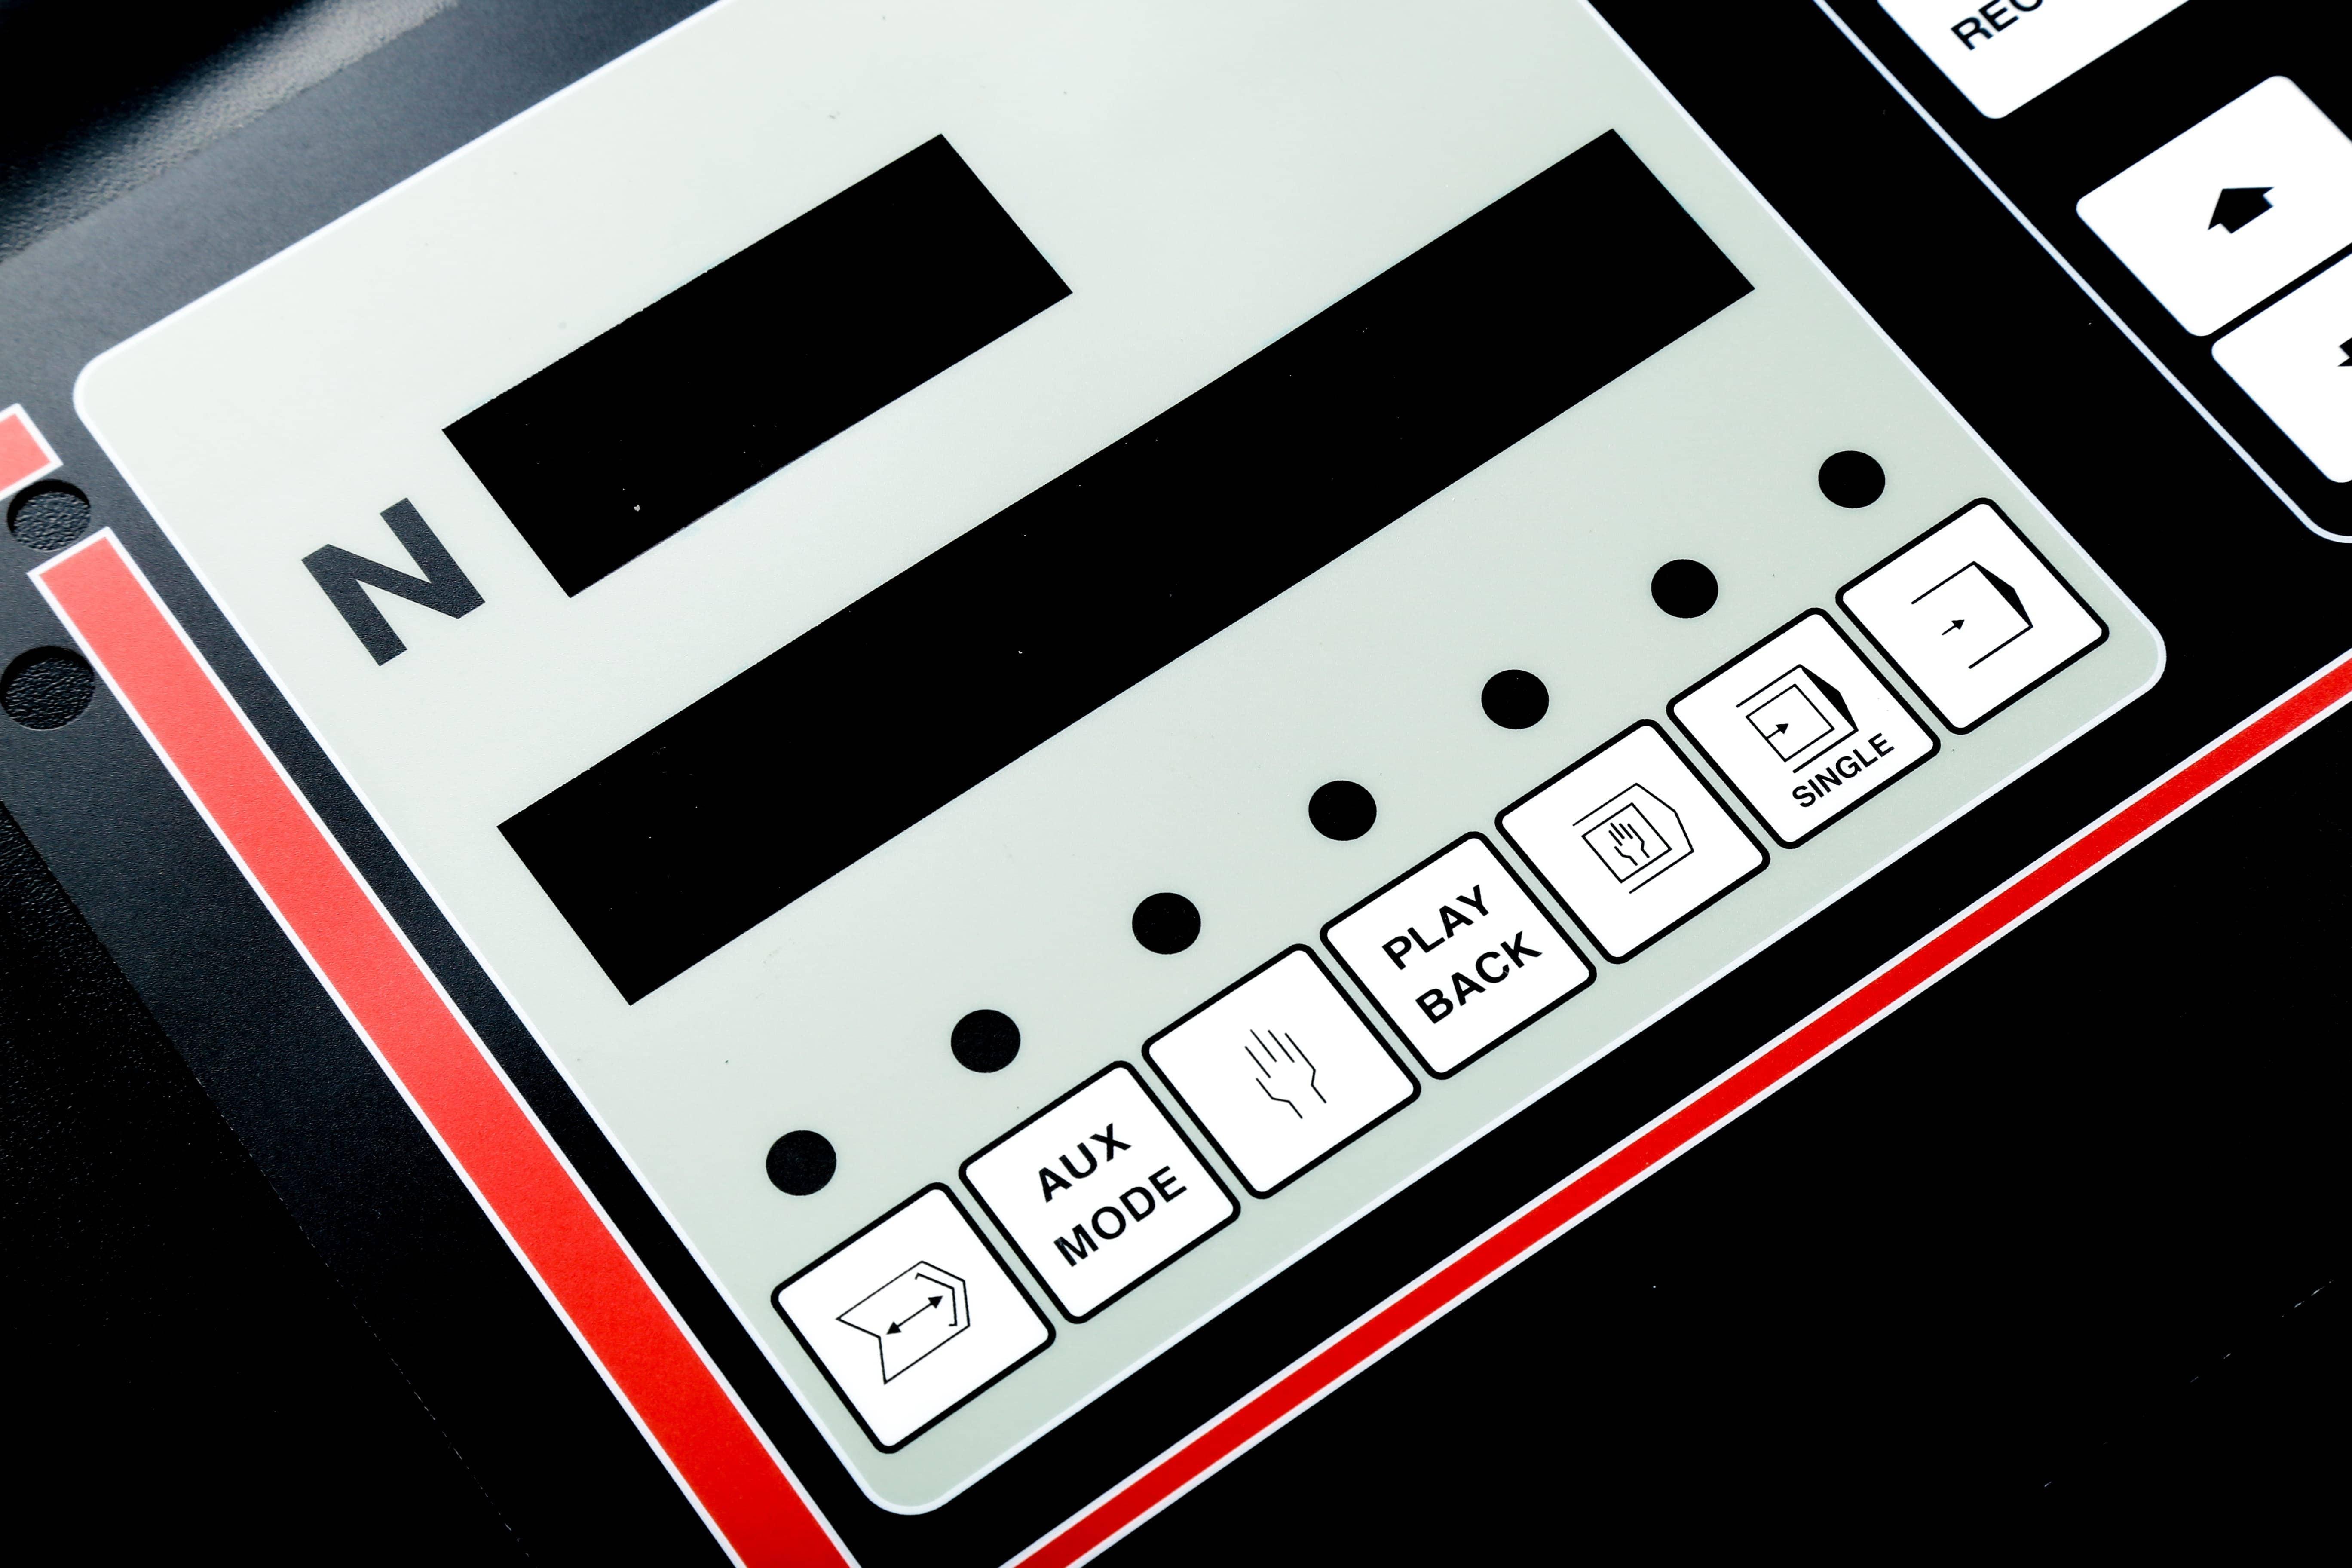 Folientastatur mit Buttons Nahaufnahme